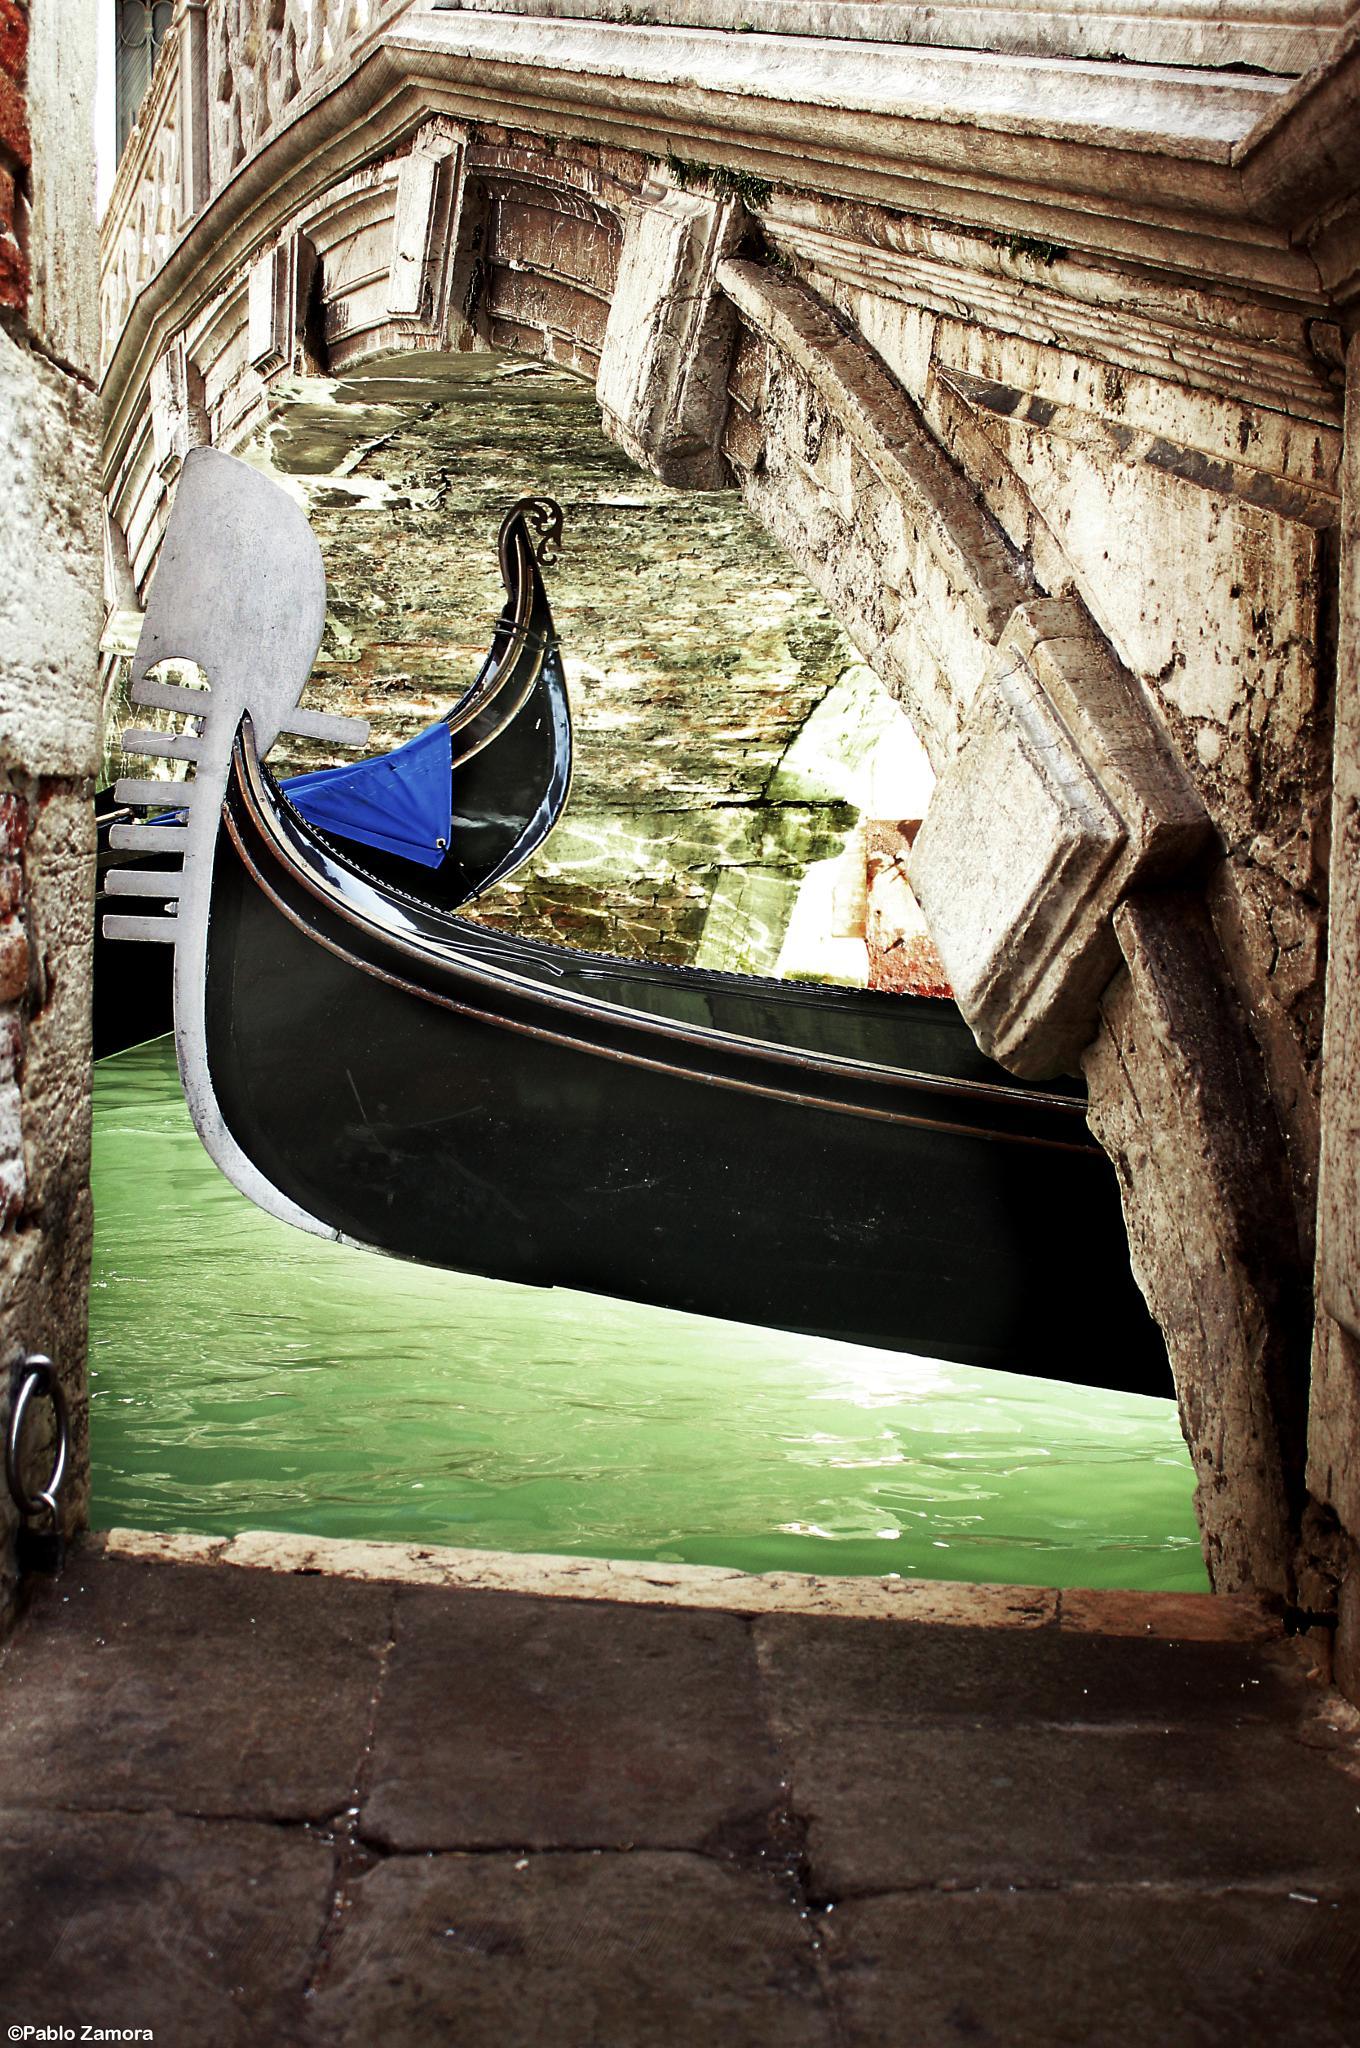 Venezia by Pablo Zamora